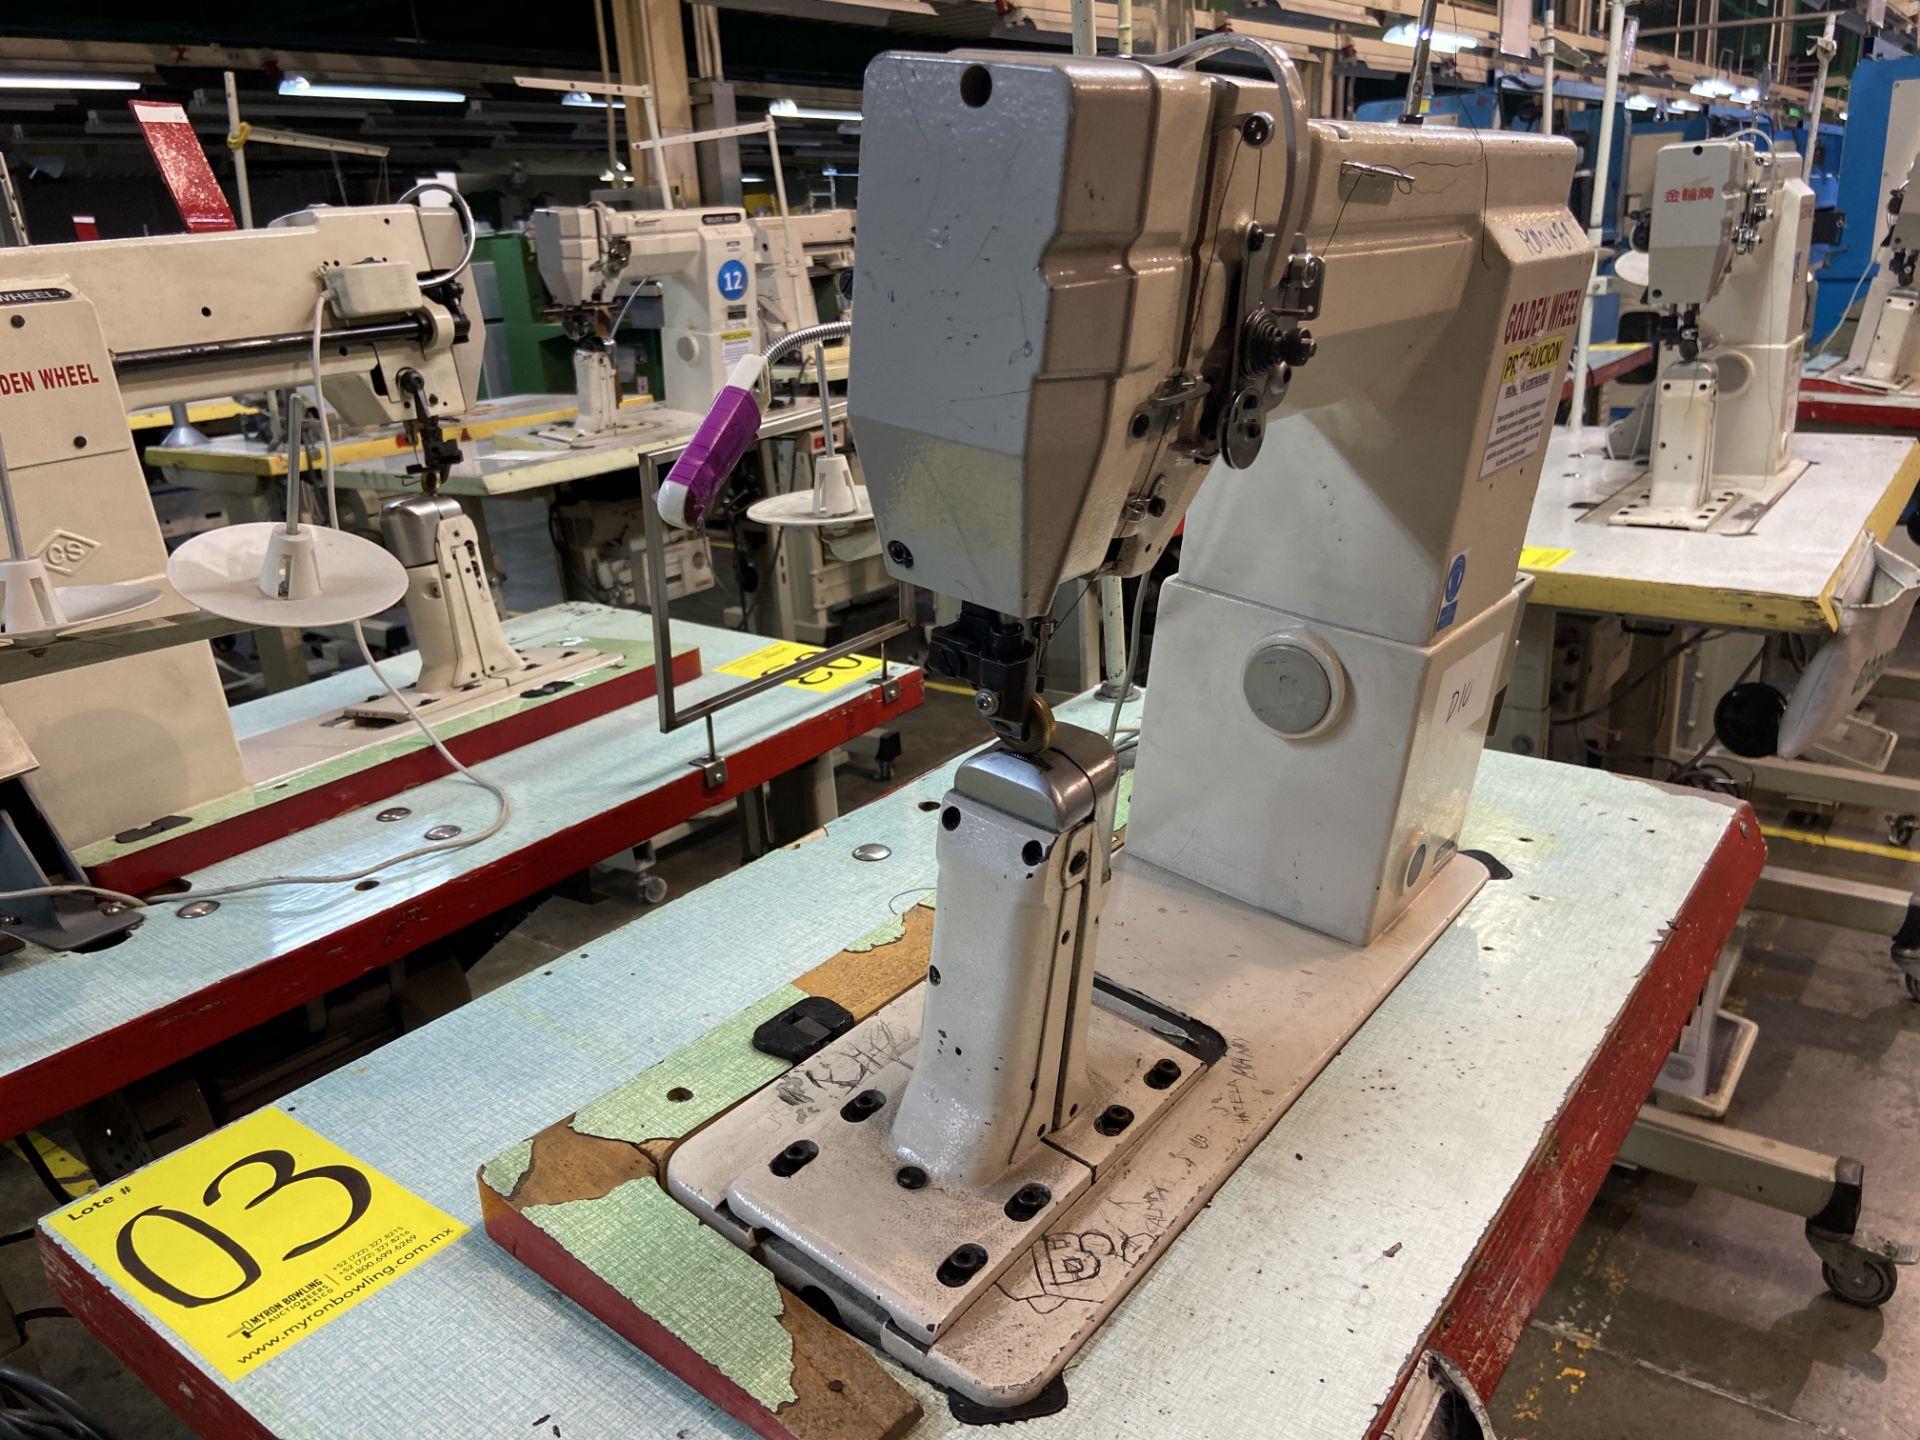 Lot 3 - (2) Máquinas de costura marca Golden Wheel de una aguja.